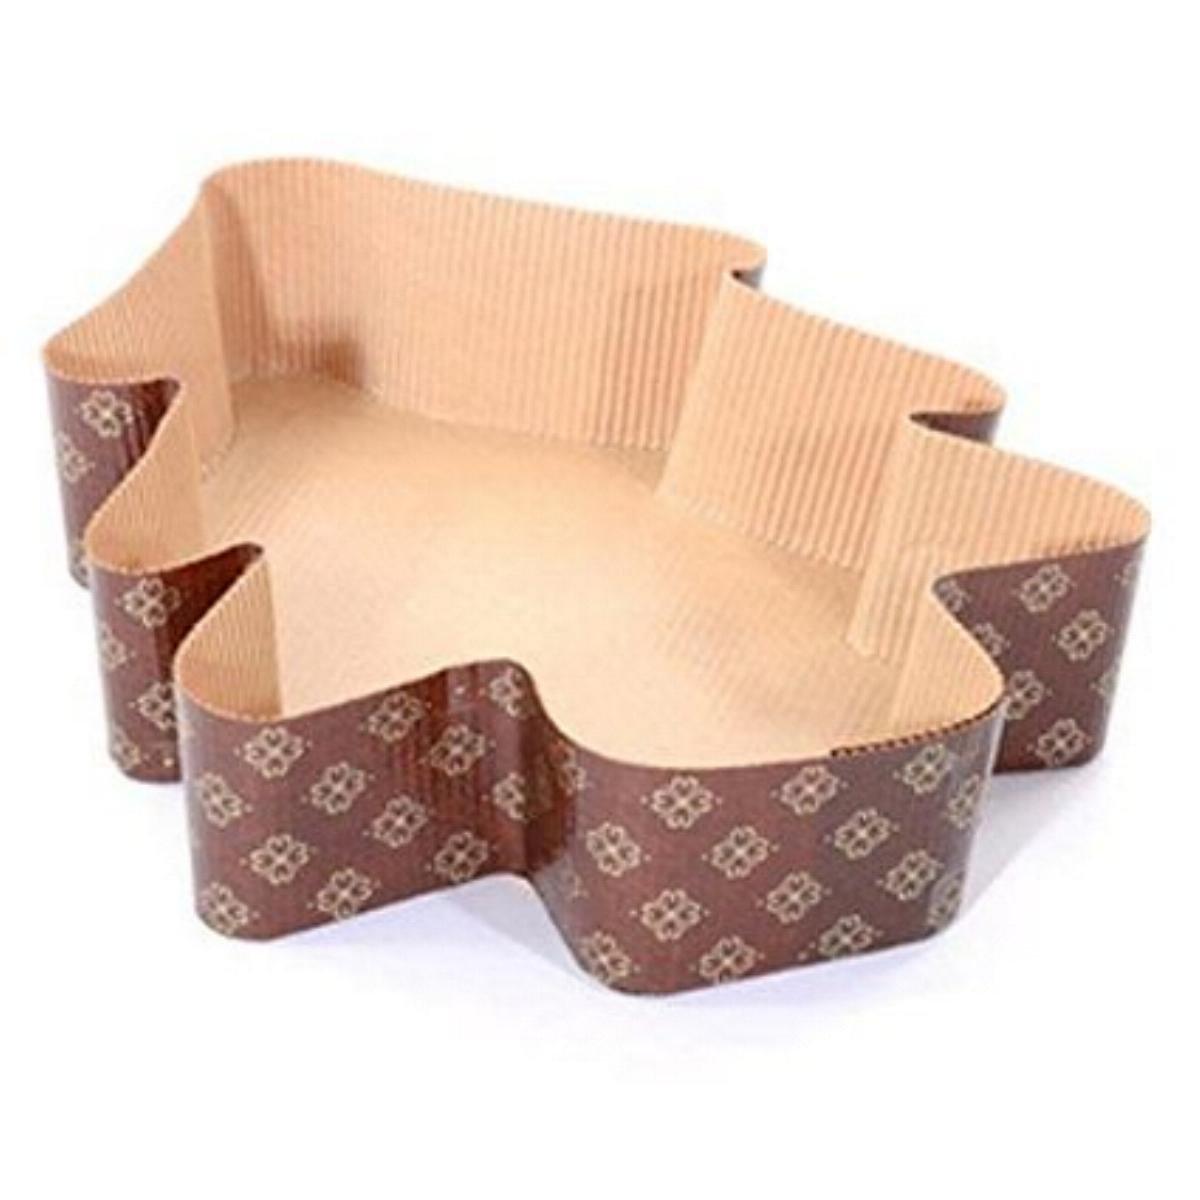 Beauty Cart Molde para panettone Árbol de Navidad de Papel Horno 6 Piezas: Amazon.es: Hogar